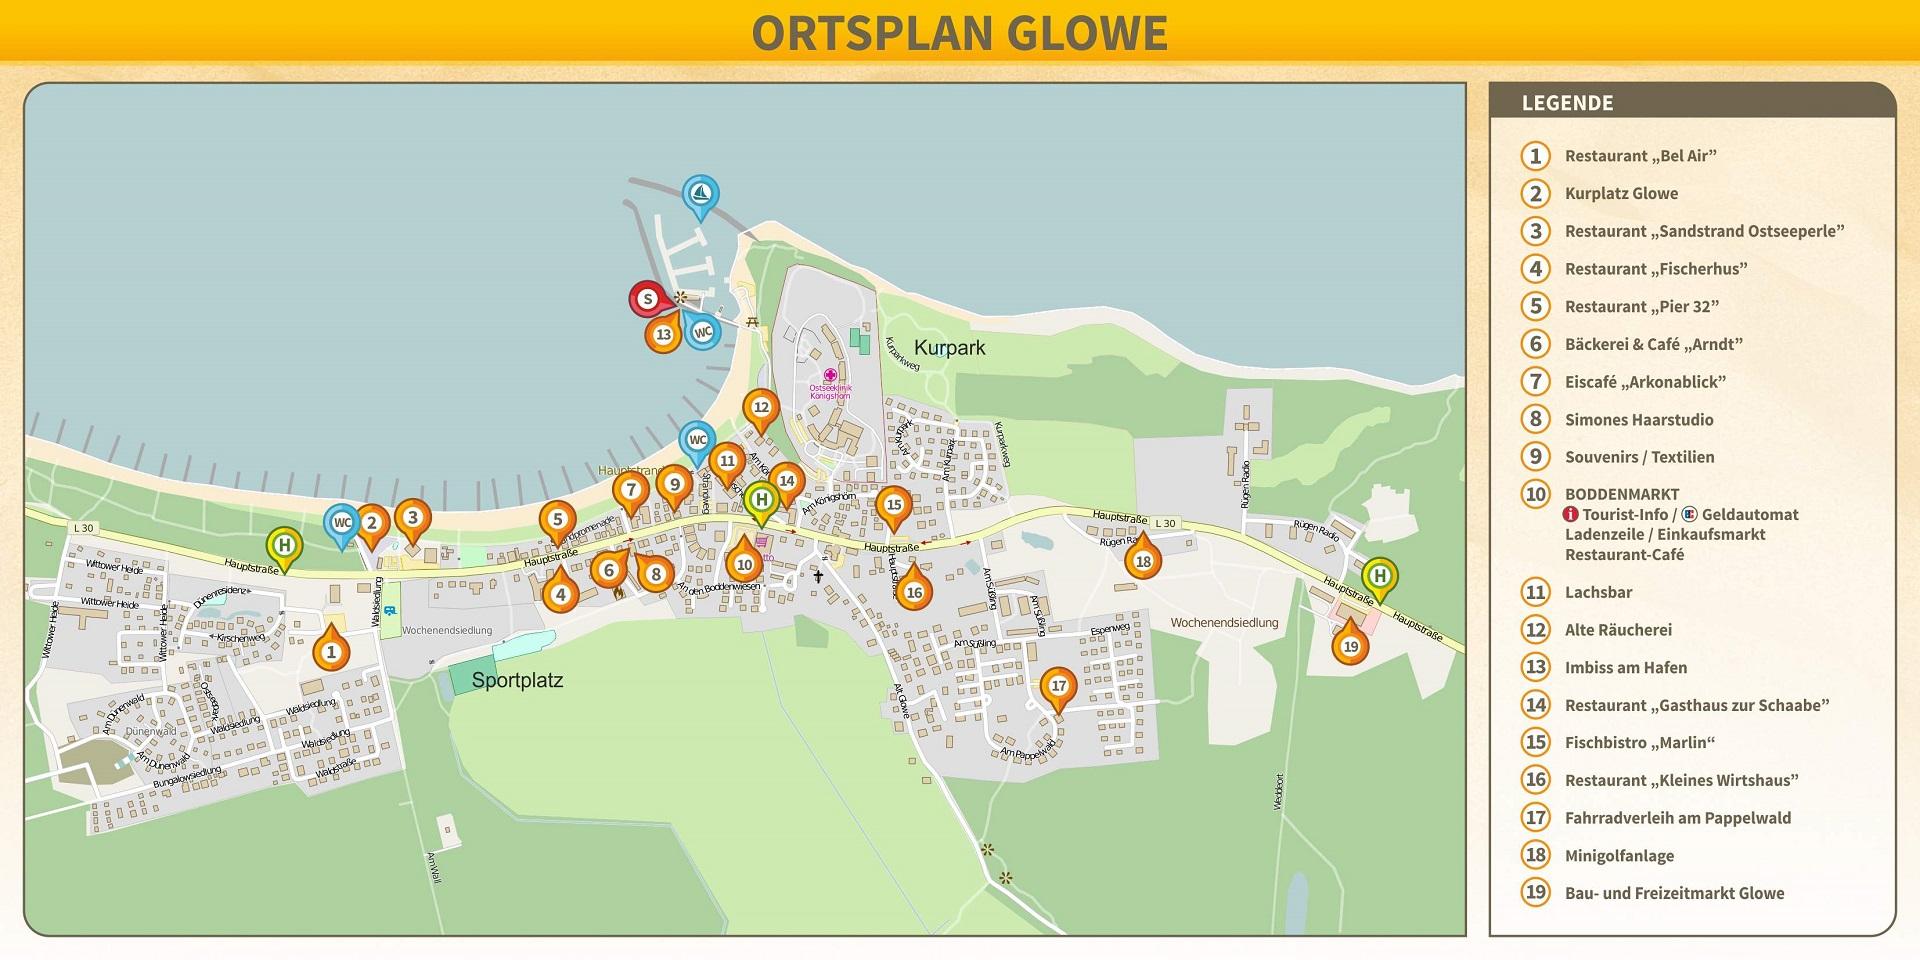 ORTSPLAN GLOWE